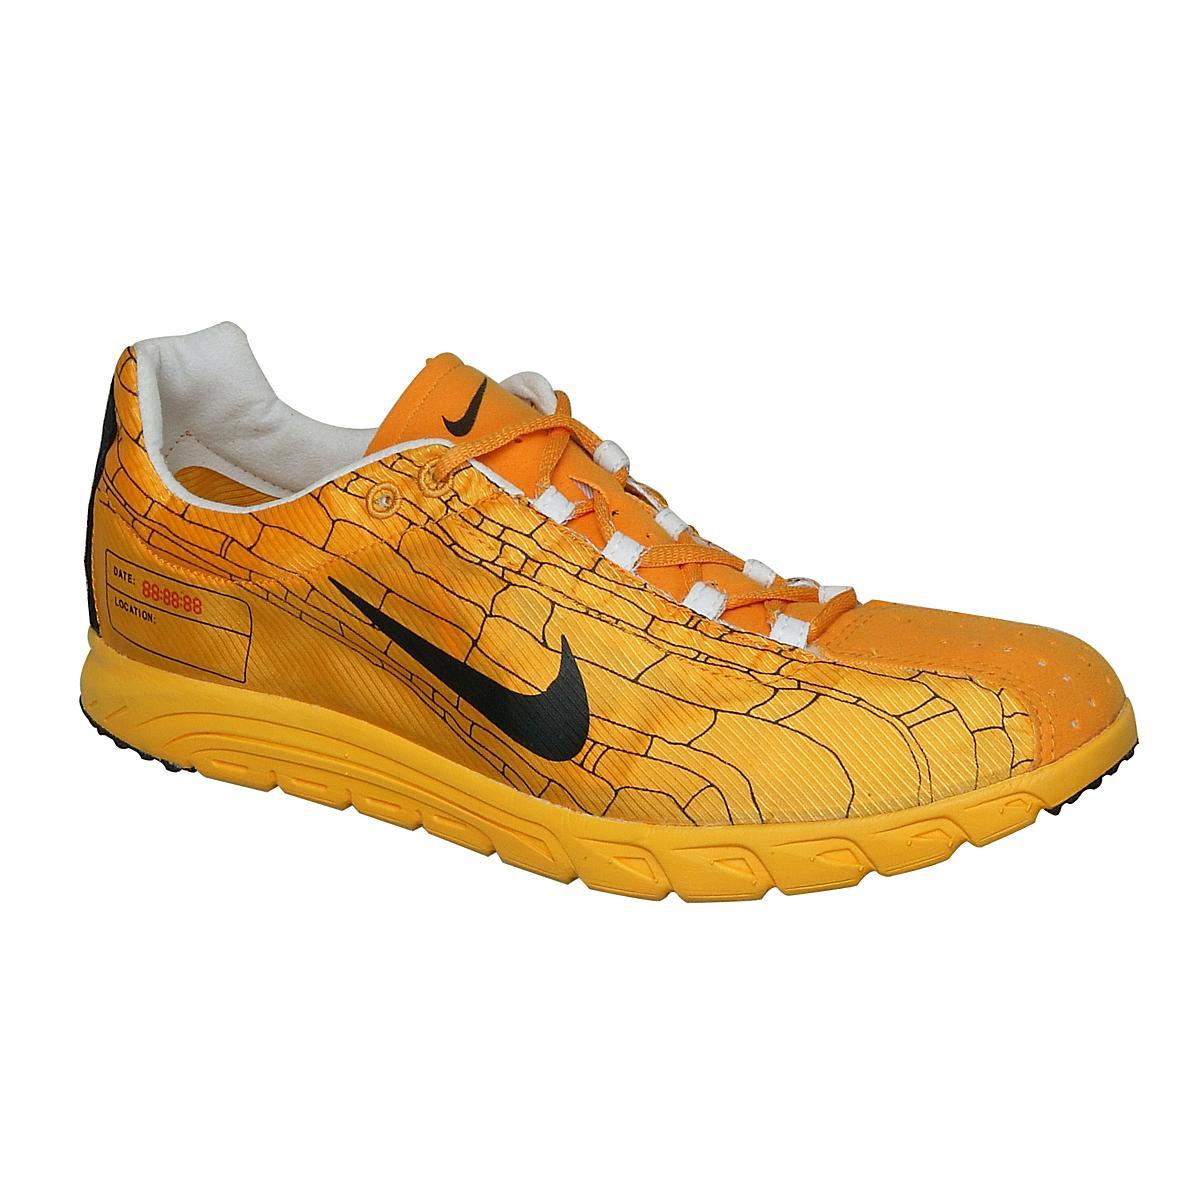 b37d195ae5f Mens Nike Mayfly Racing Shoe at Road Runner Sports